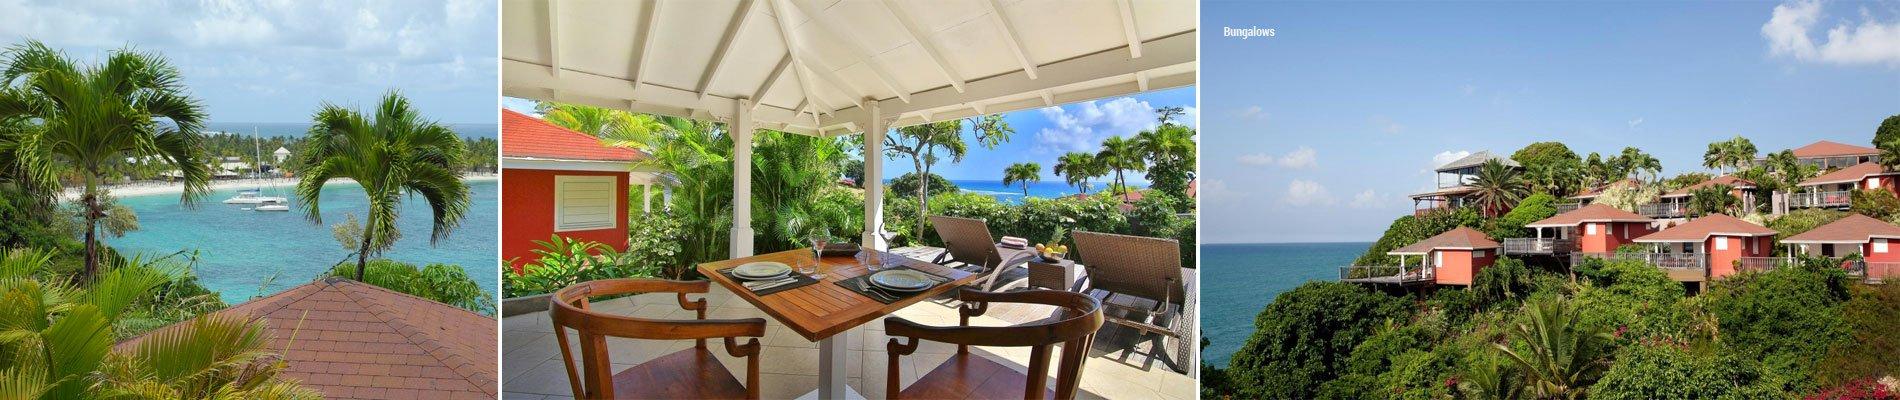 -toubana-guadeloupe-tropisch-frankrijk